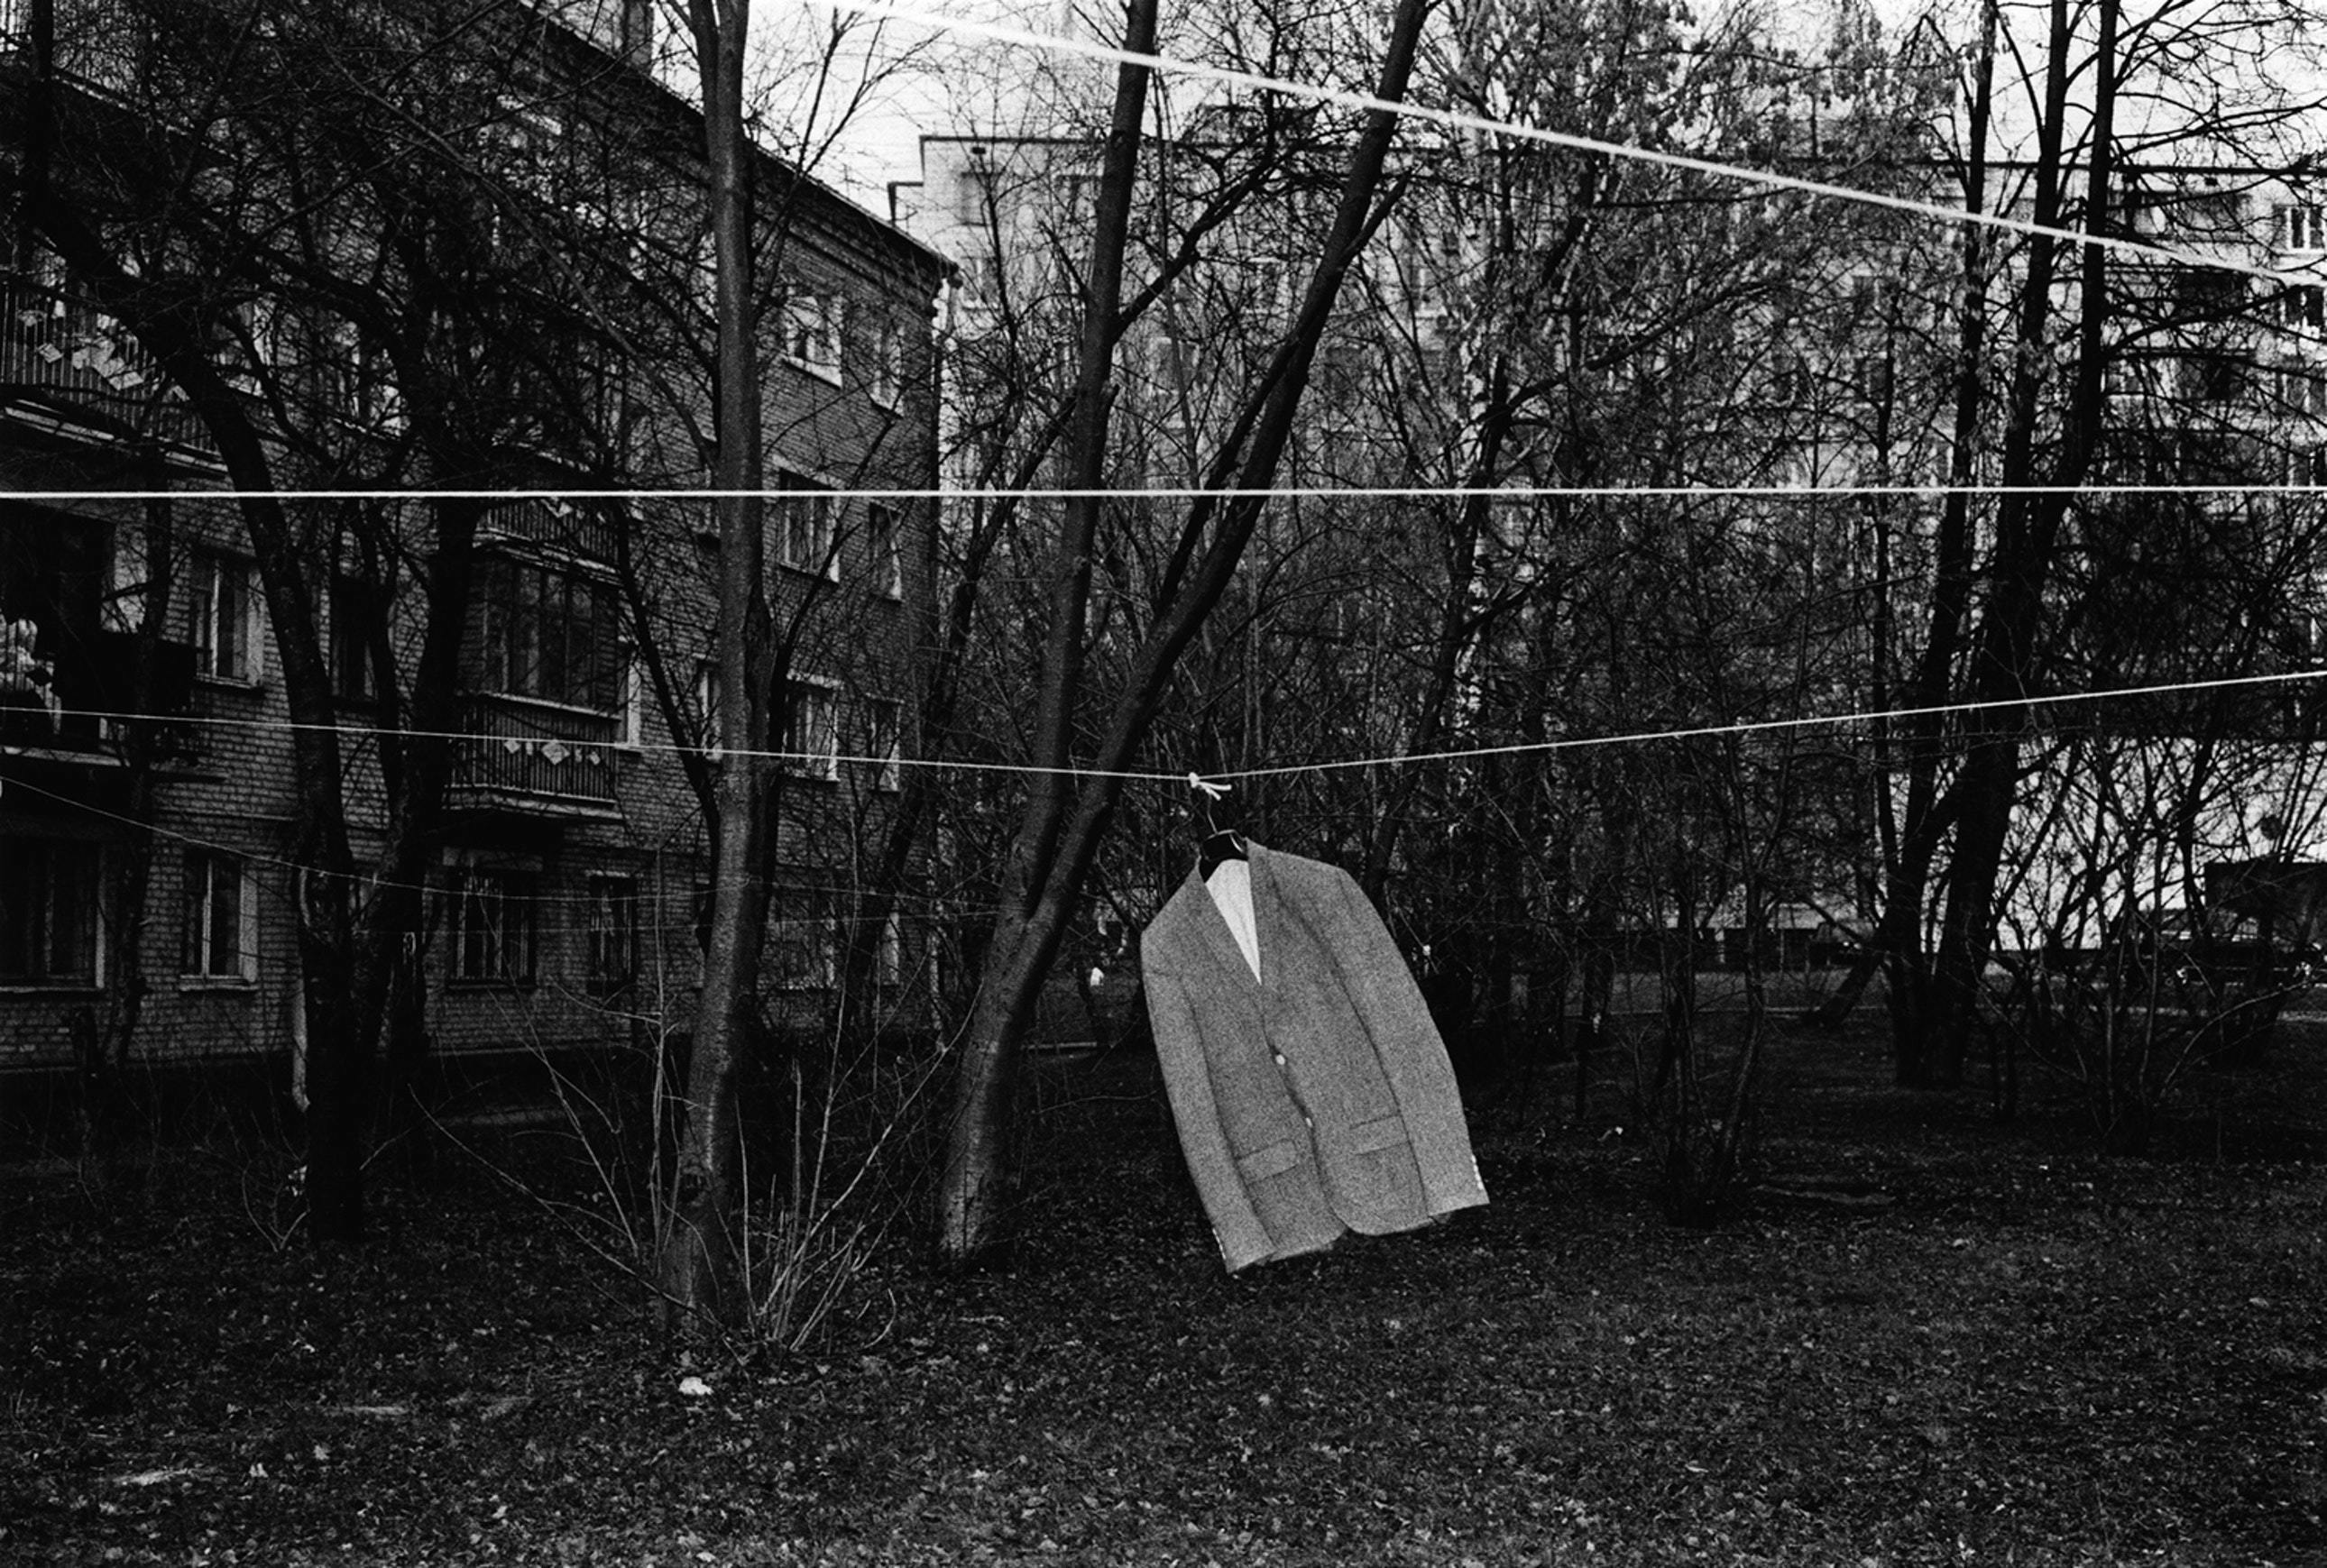 Фото: Евгений Пустарнаков